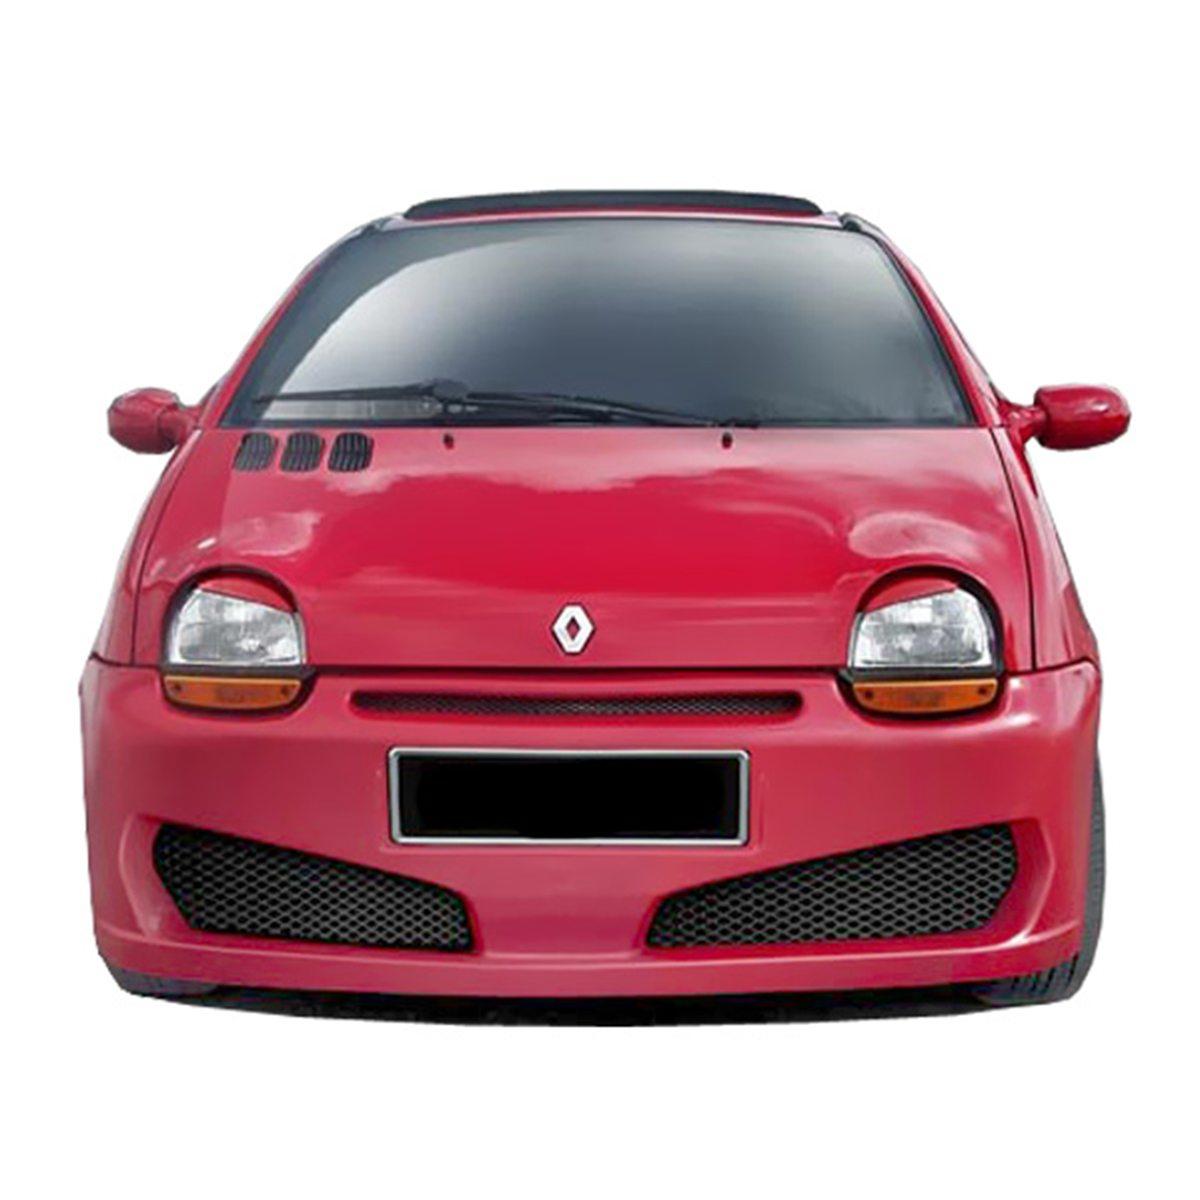 Renault-Twingo-Neat-Frt-PCS186